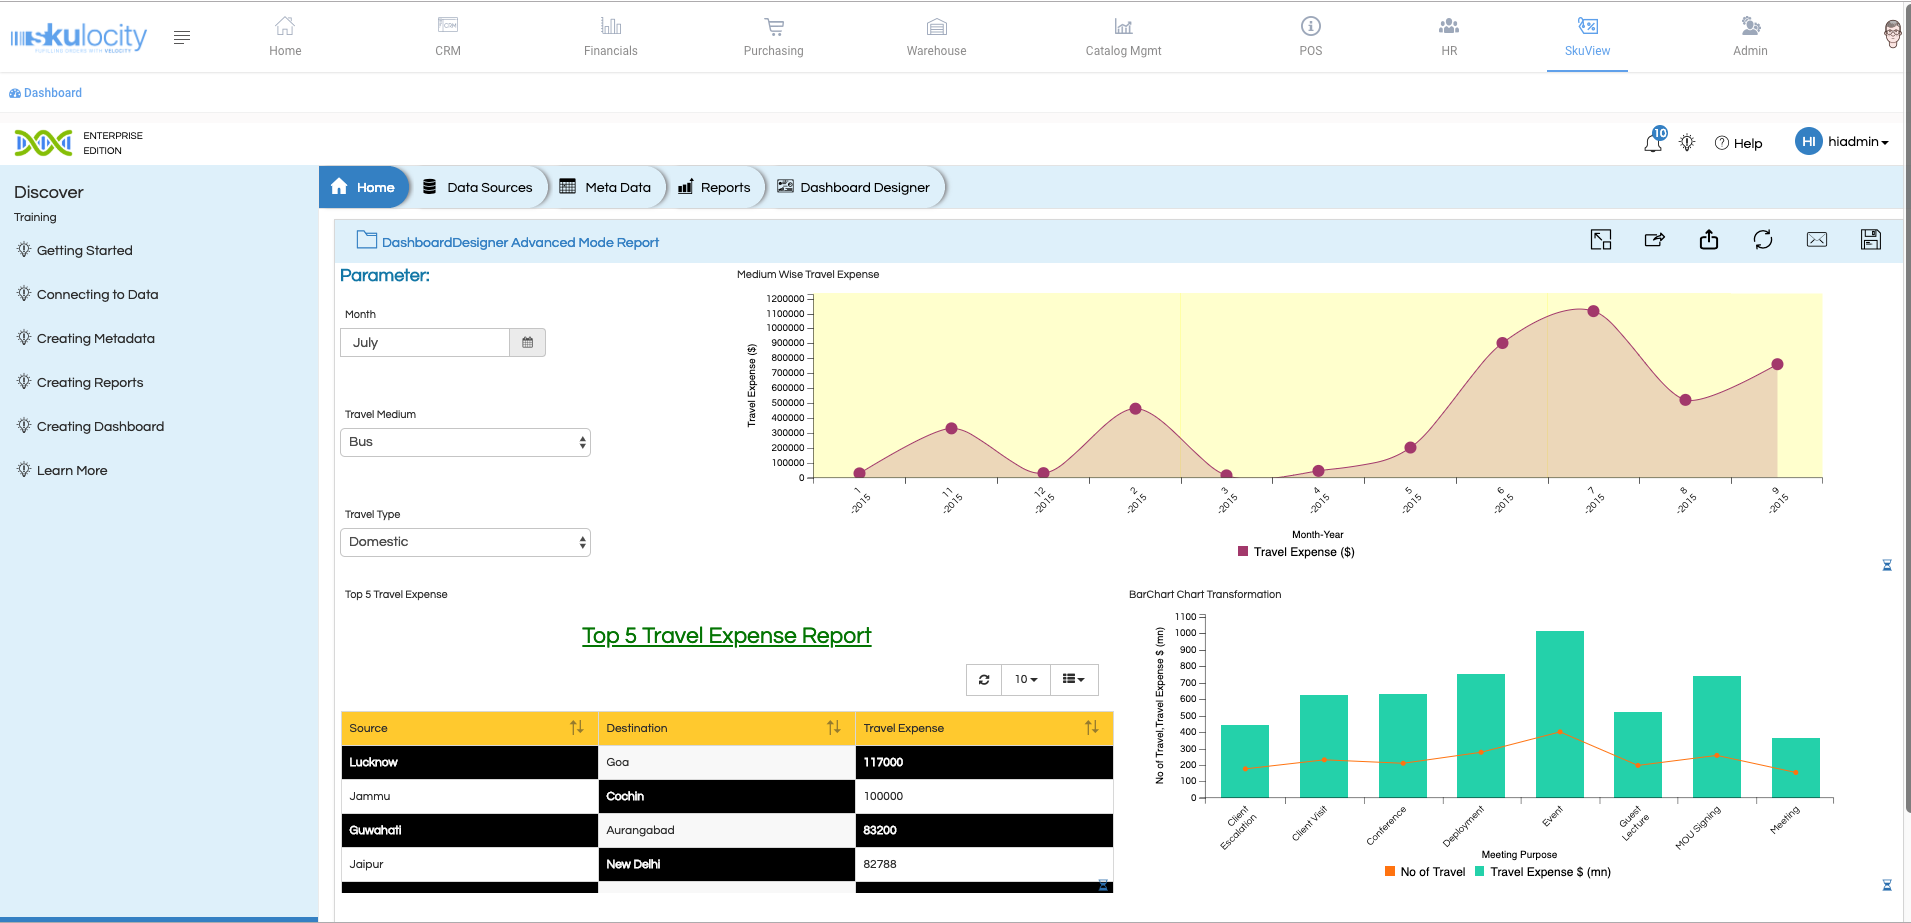 Skulocity business intelligence dashboard